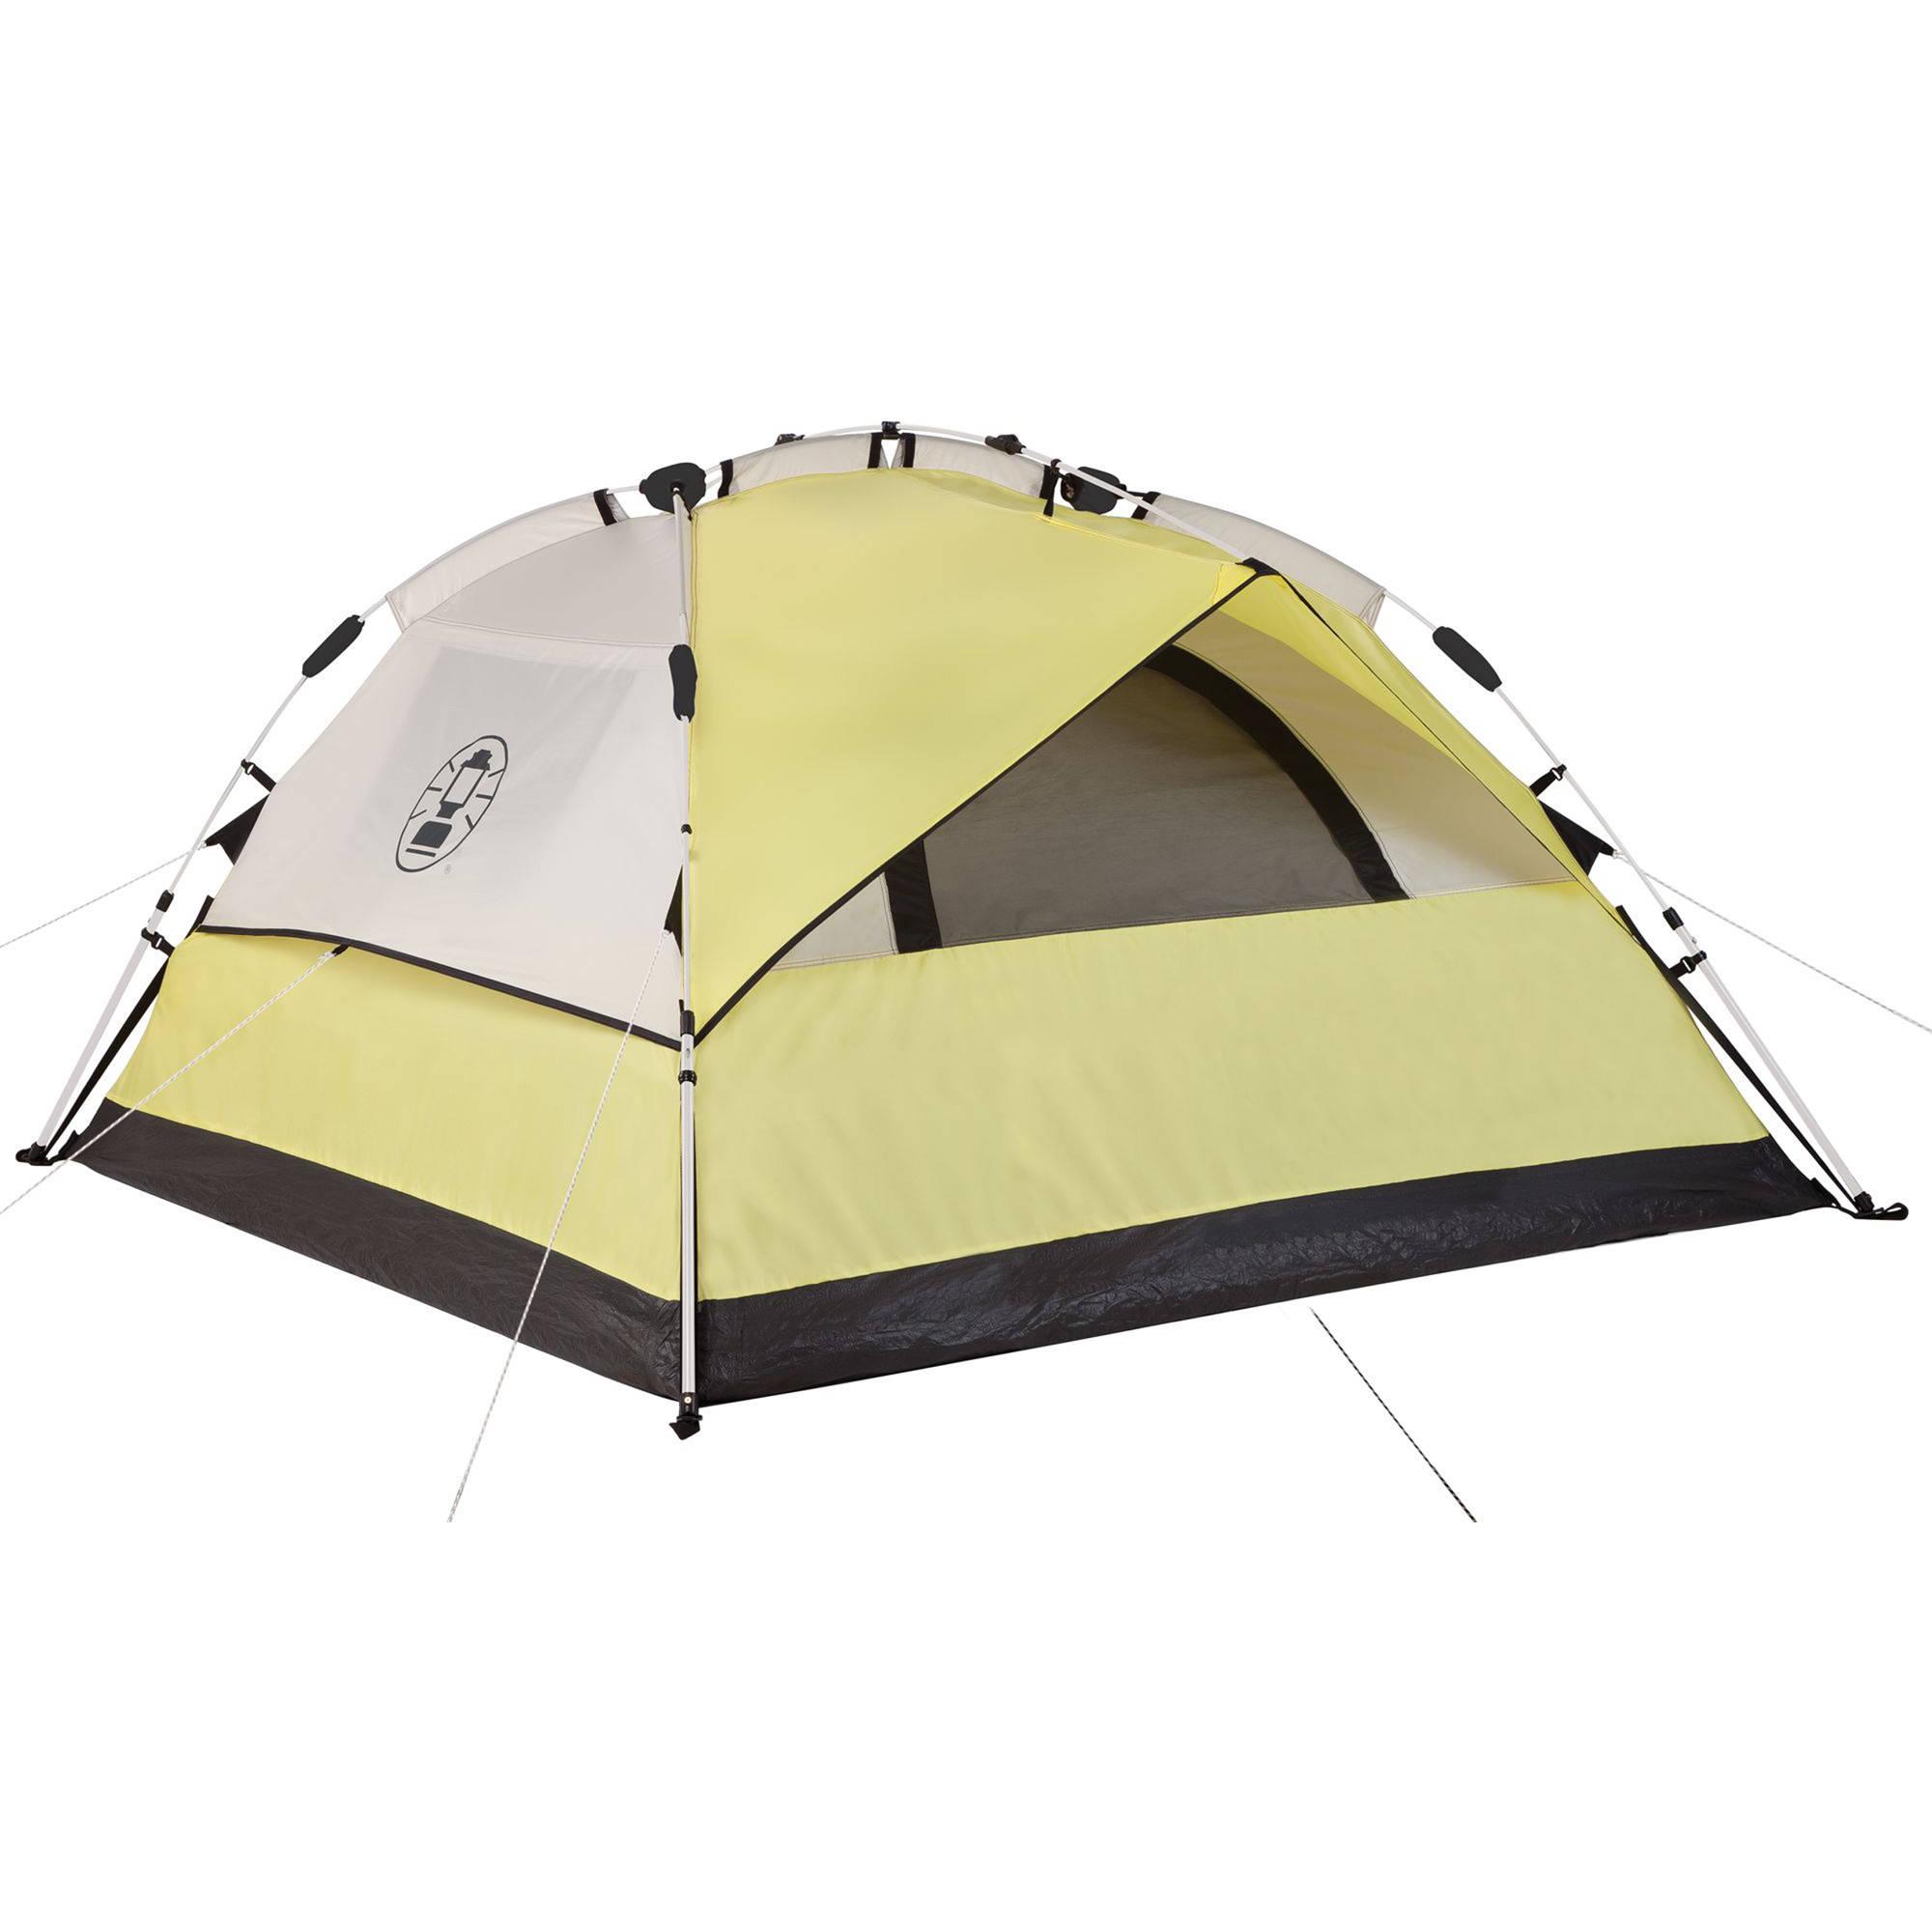 Coleman Instant Dome Tent (4-Person). As shown on manufactureru0027s web site  sc 1 st  Bu0026H & Coleman Instant Dome Tent (4-Person) 2000015673 Bu0026H Photo Video